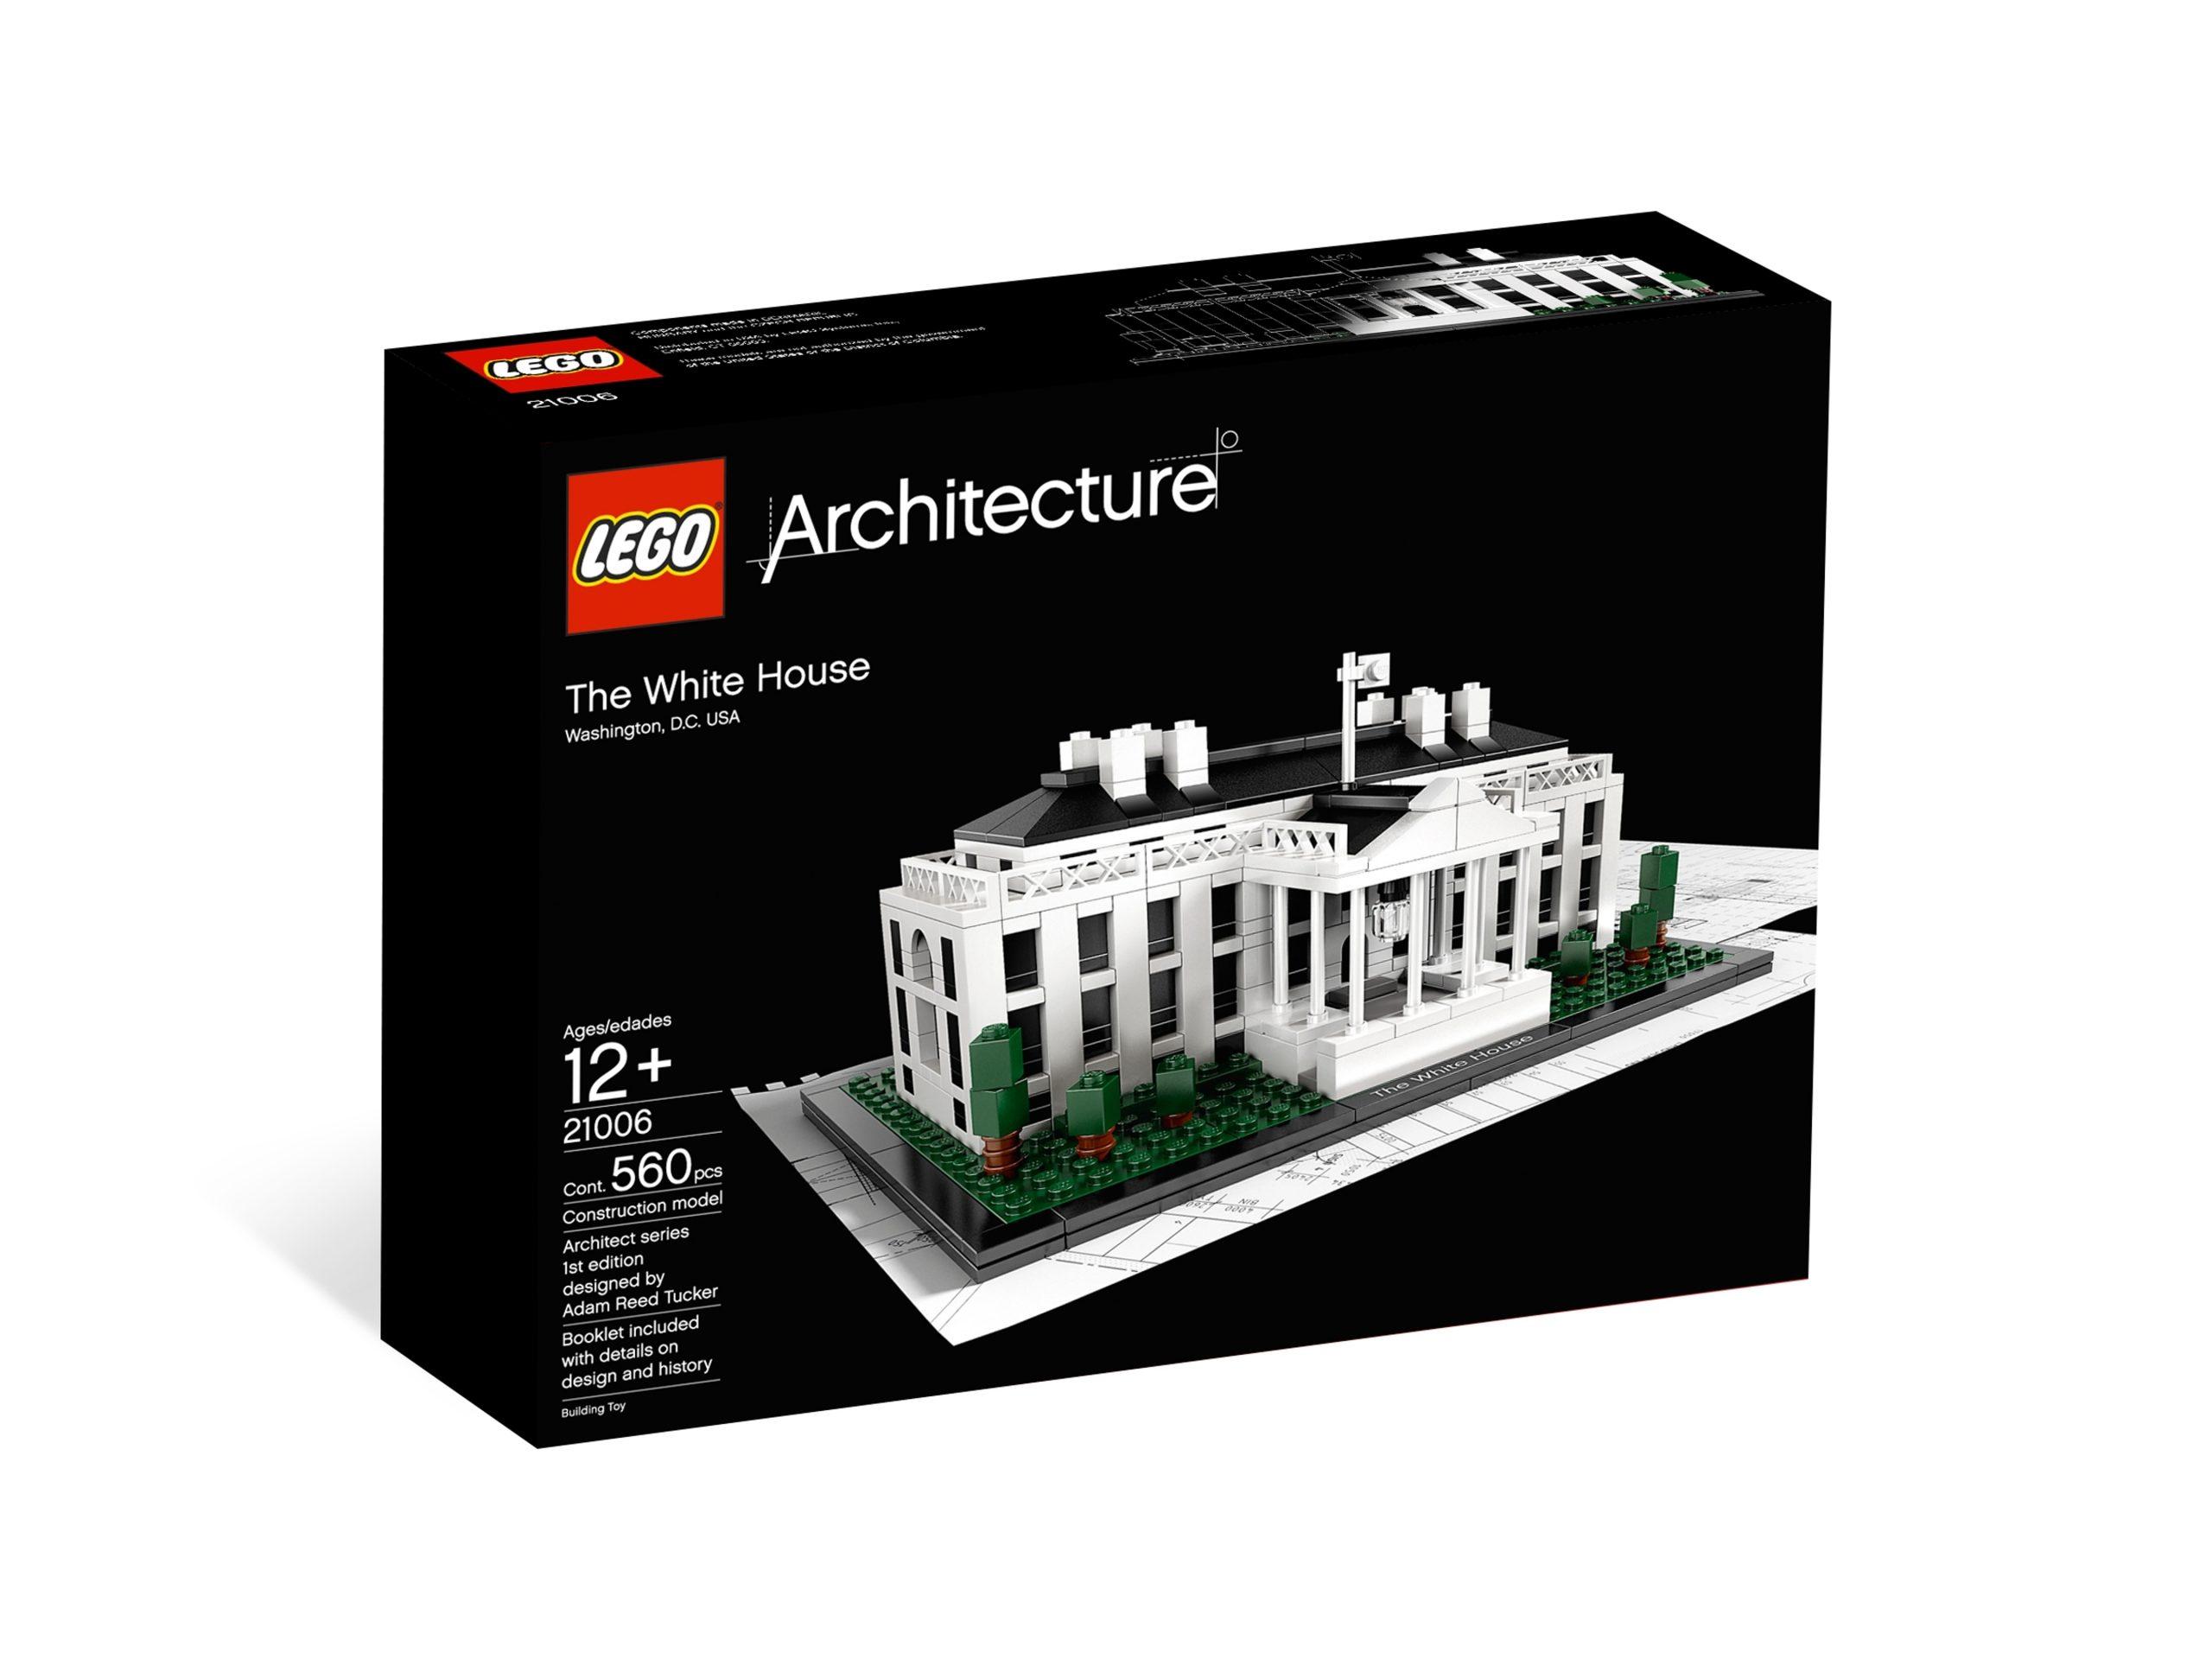 lego 21006 la maison blanche scaled